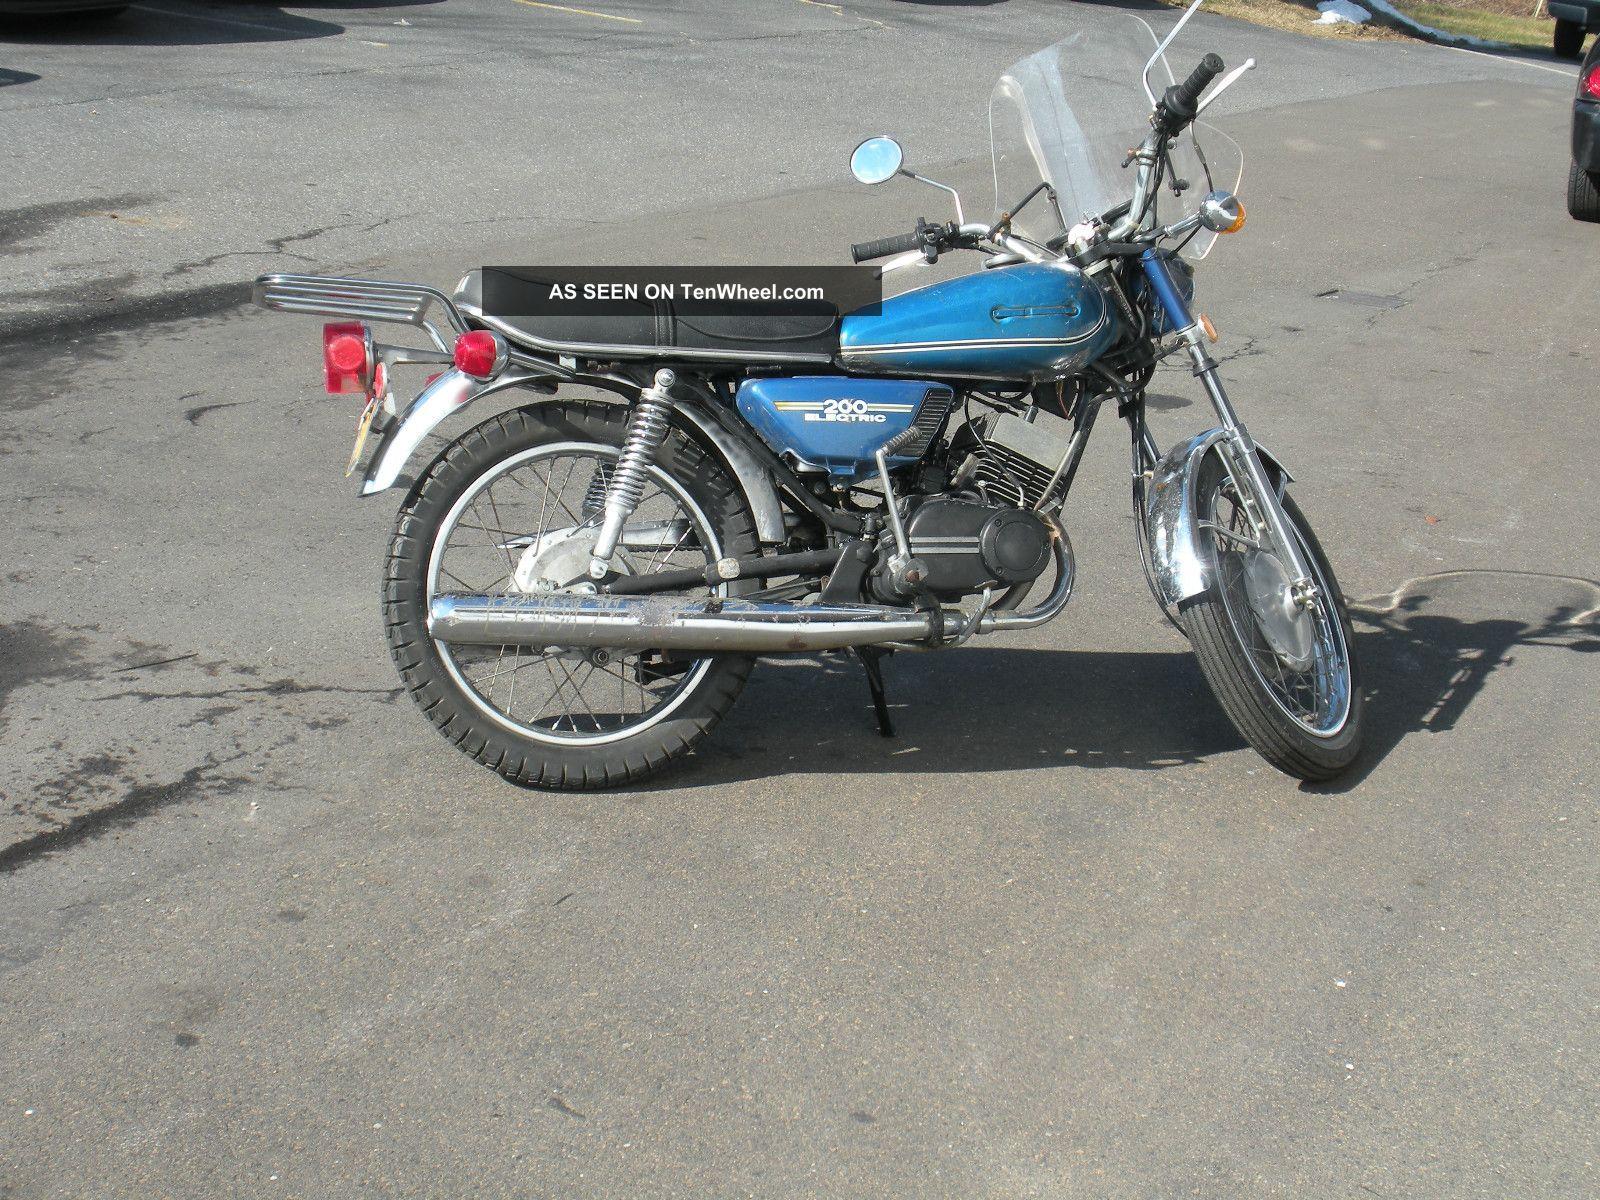 1975 Yamaha Rd200b 2 Stroke Vintage Motorcycle